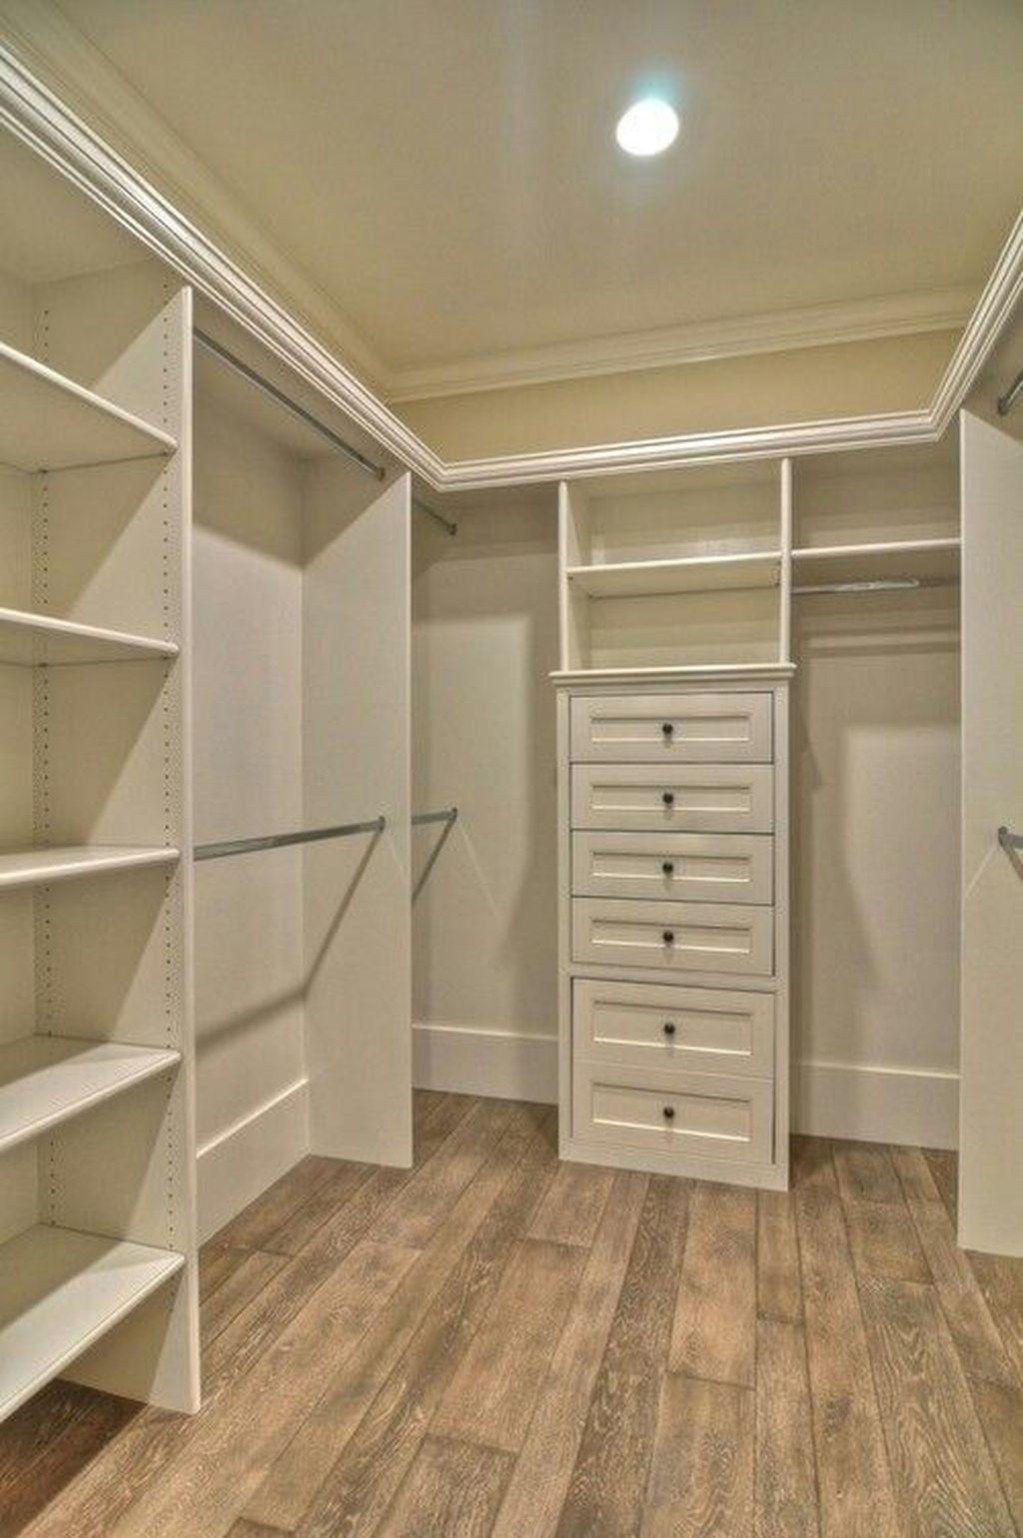 Adorable Master Bedroom Closet Designs Ideas 30  Closet layout